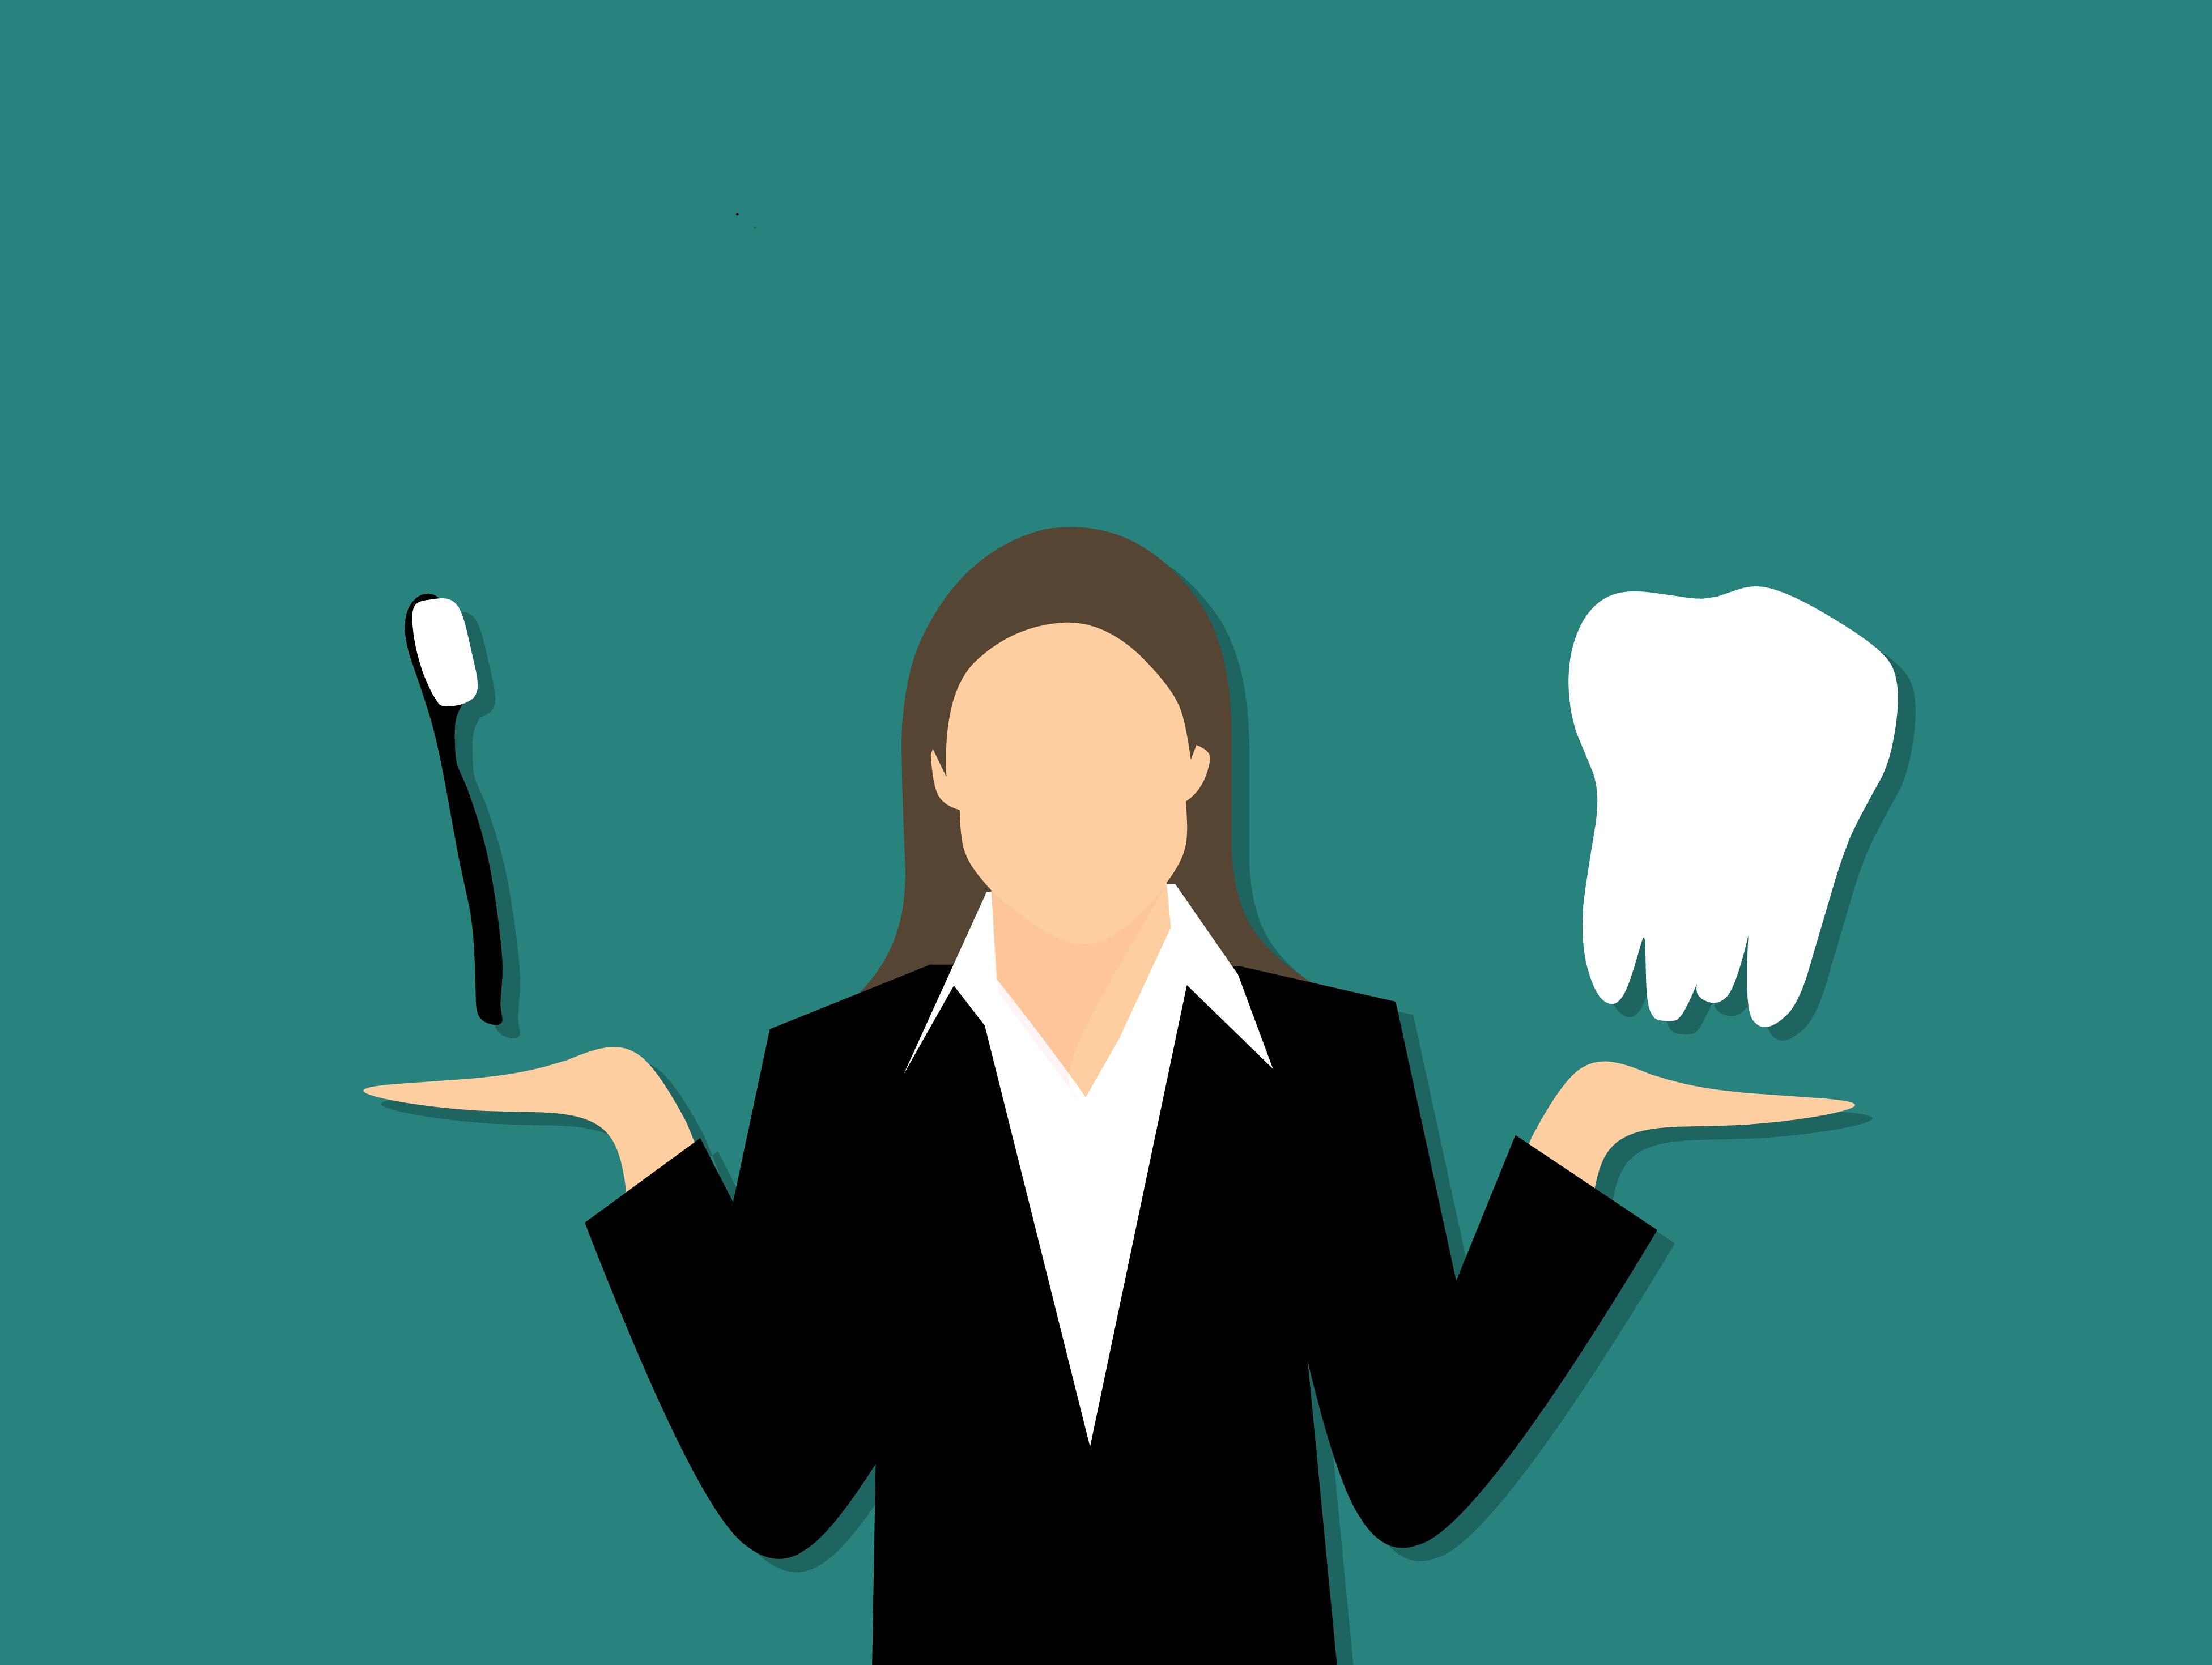 Kostenlose foto : Zahnarzt, Zahn, Zahnbürste, Kiefer, Frau ...